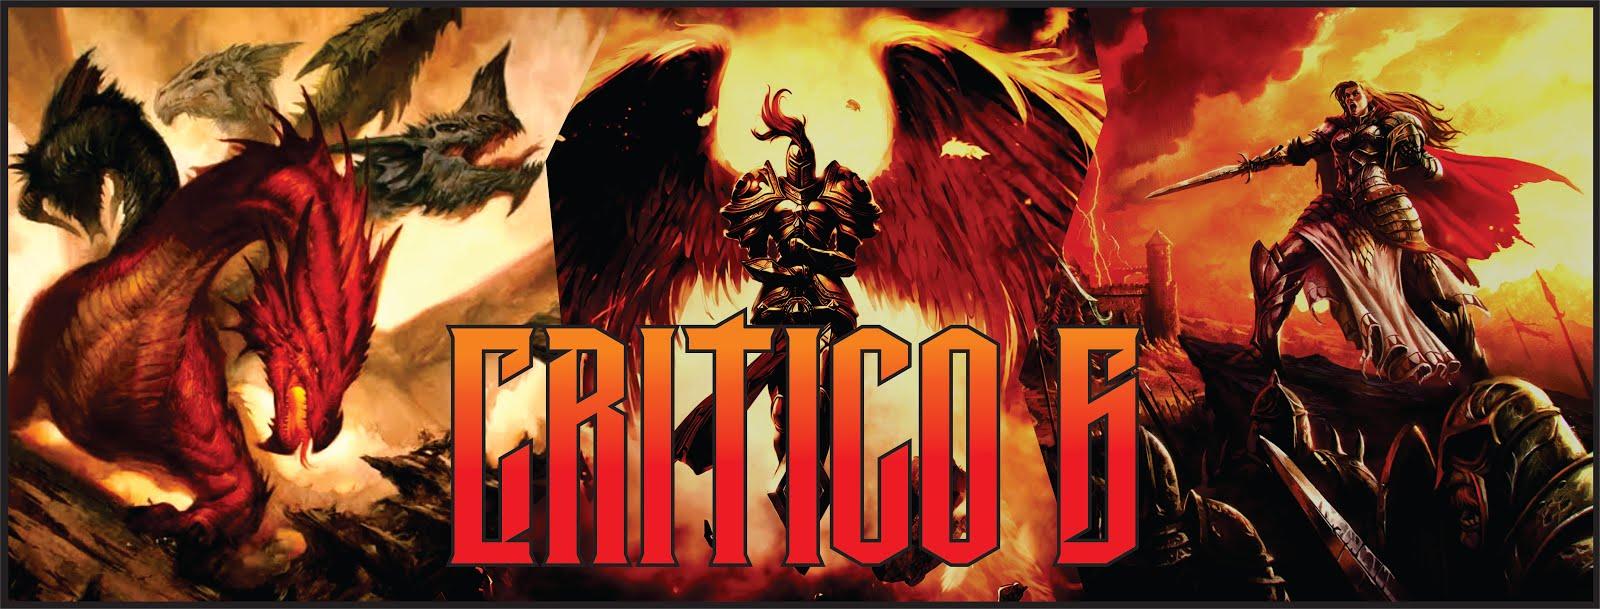 Crítico 6